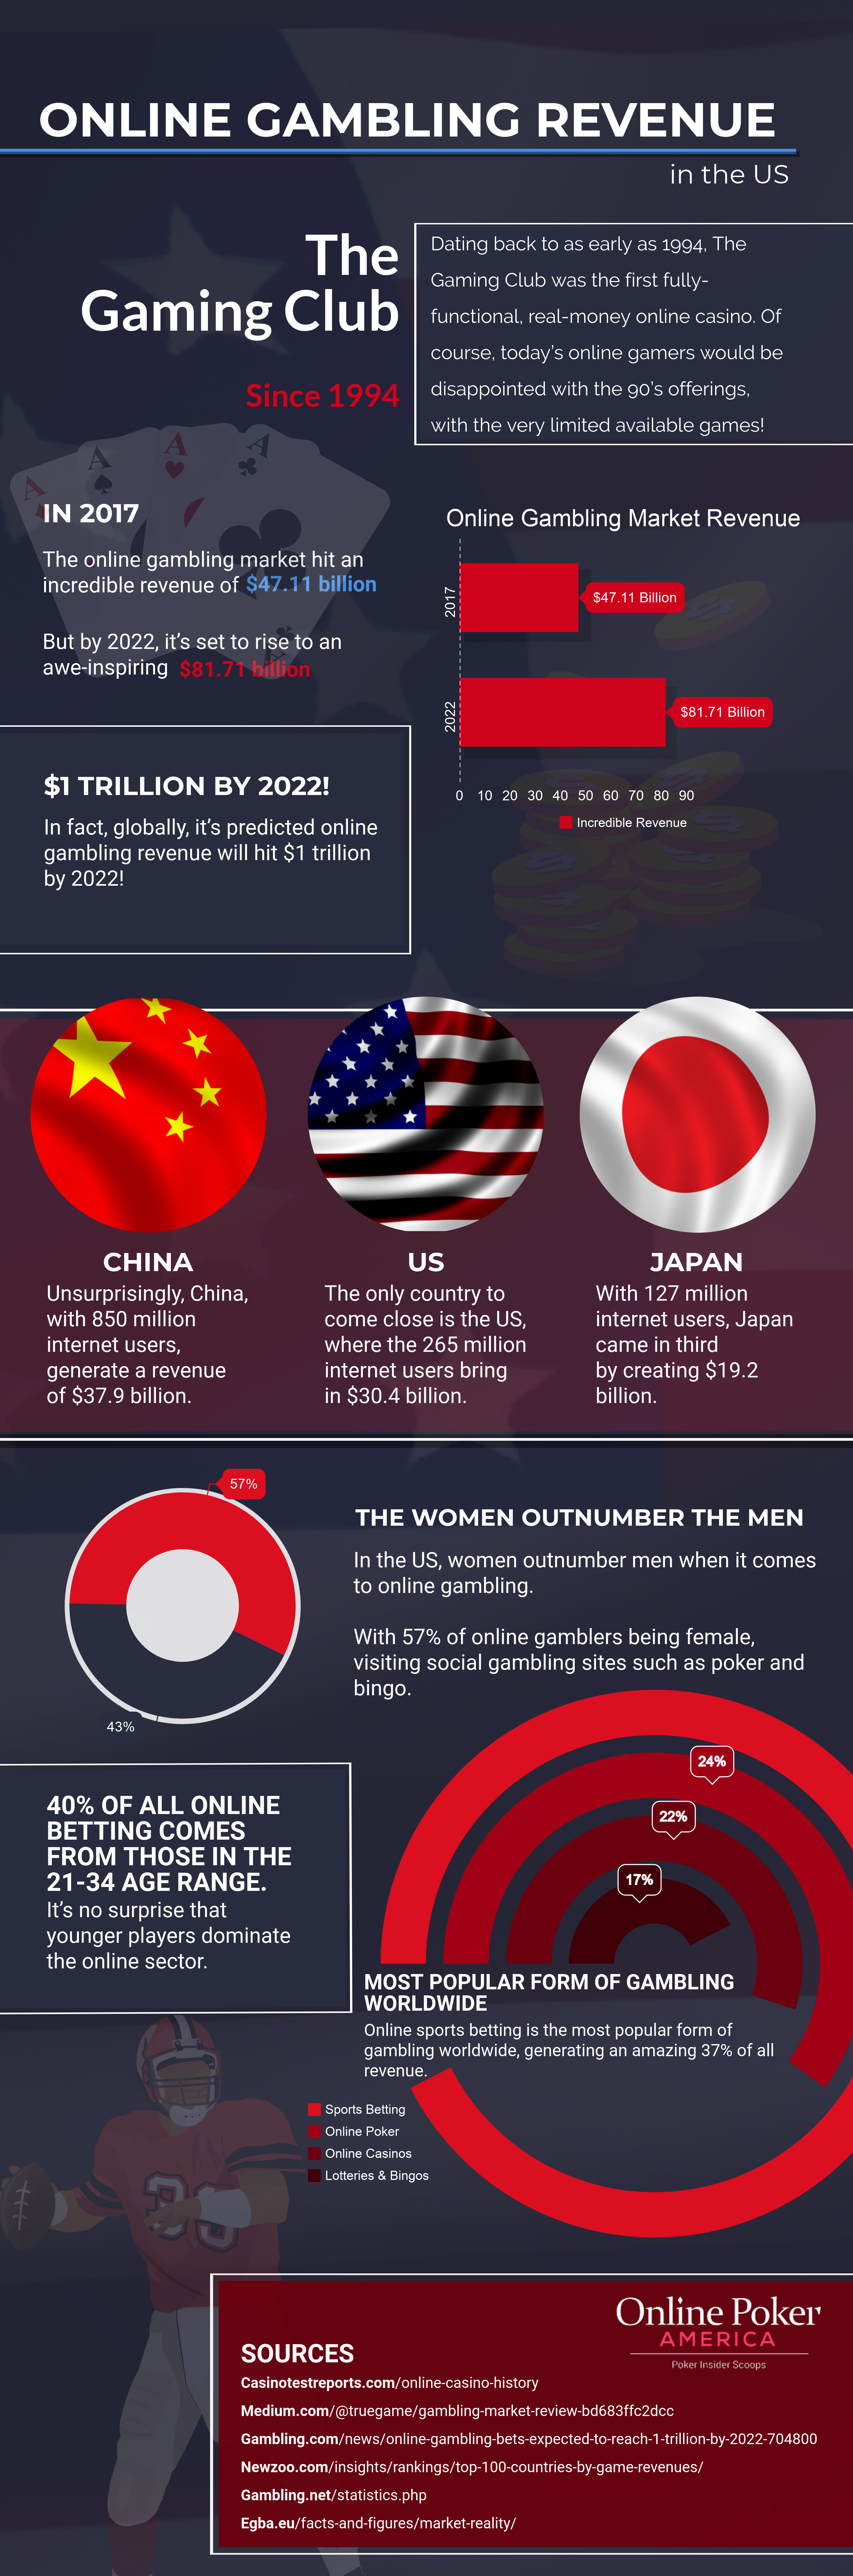 Online Gambling Revenue Across the US